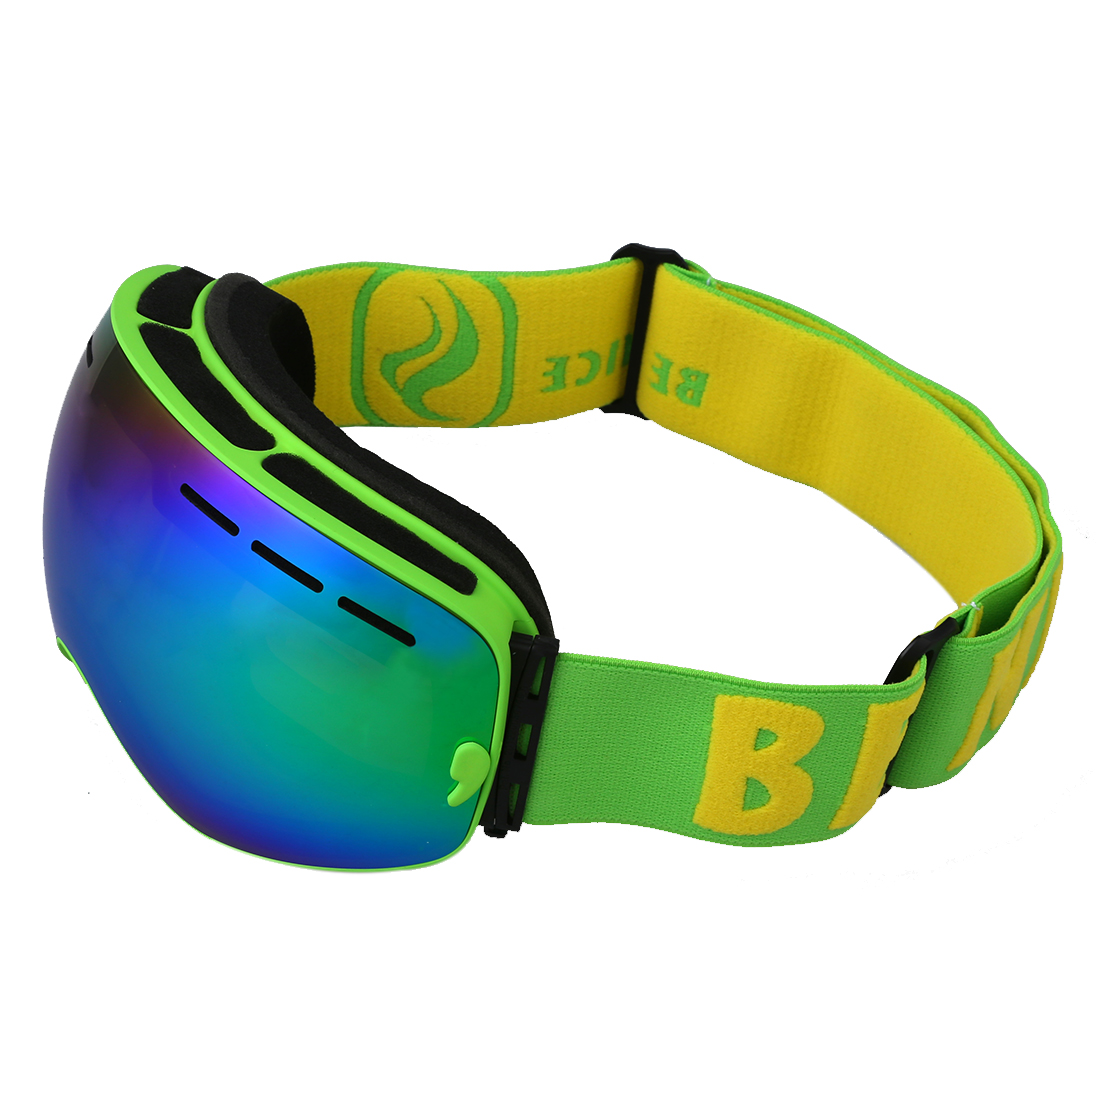 5Set Sale BENICE ski goggles double layer anti-fog eyes green frame